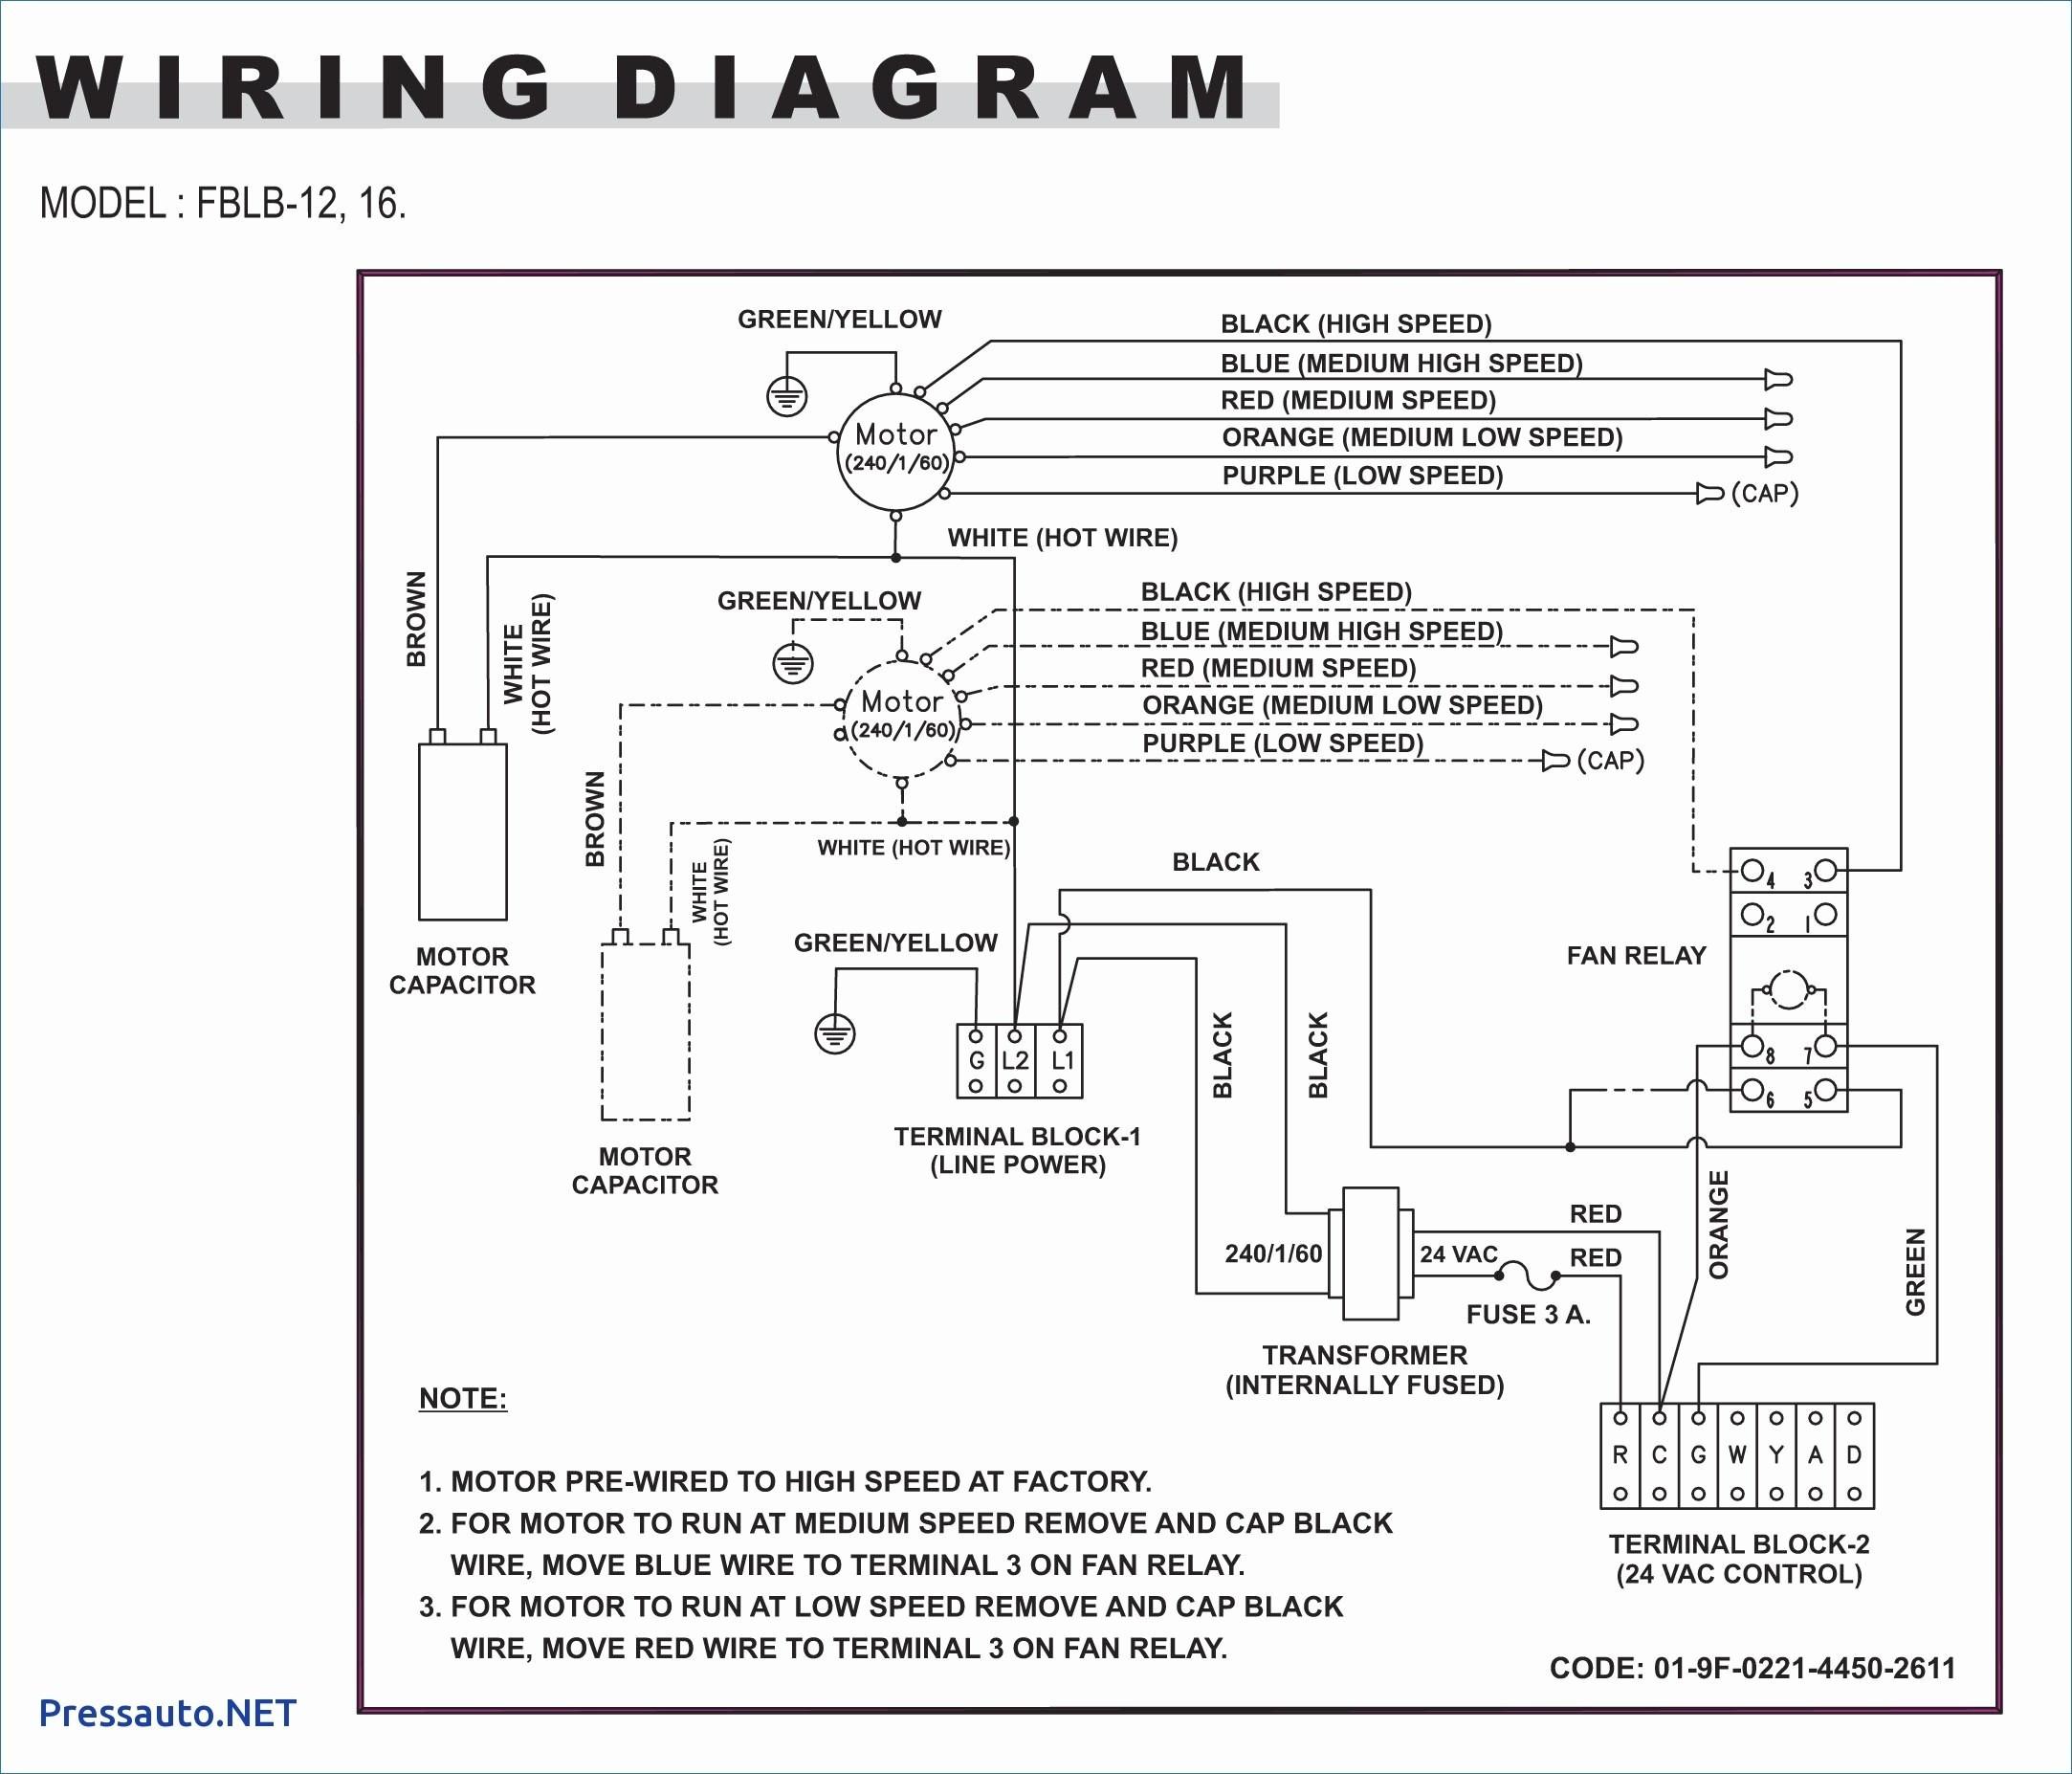 12ax7 heater wiring diagram all wiring diagram 12AX7 6.3V Filament Wiring